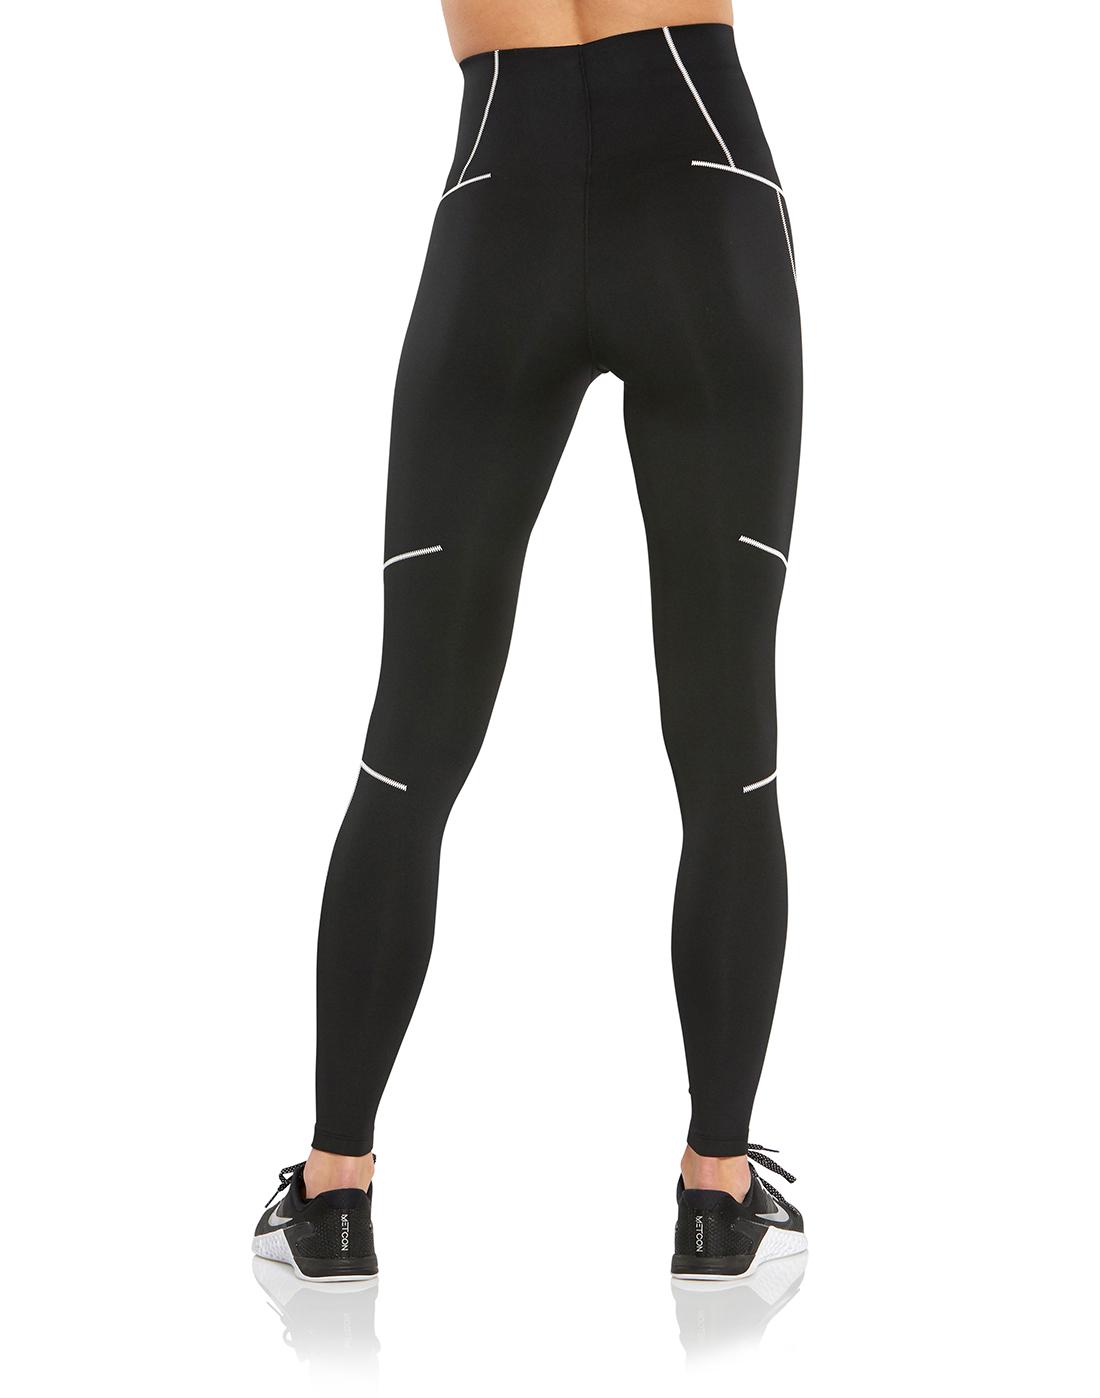 Women's Black Nike Zig Zag Tights